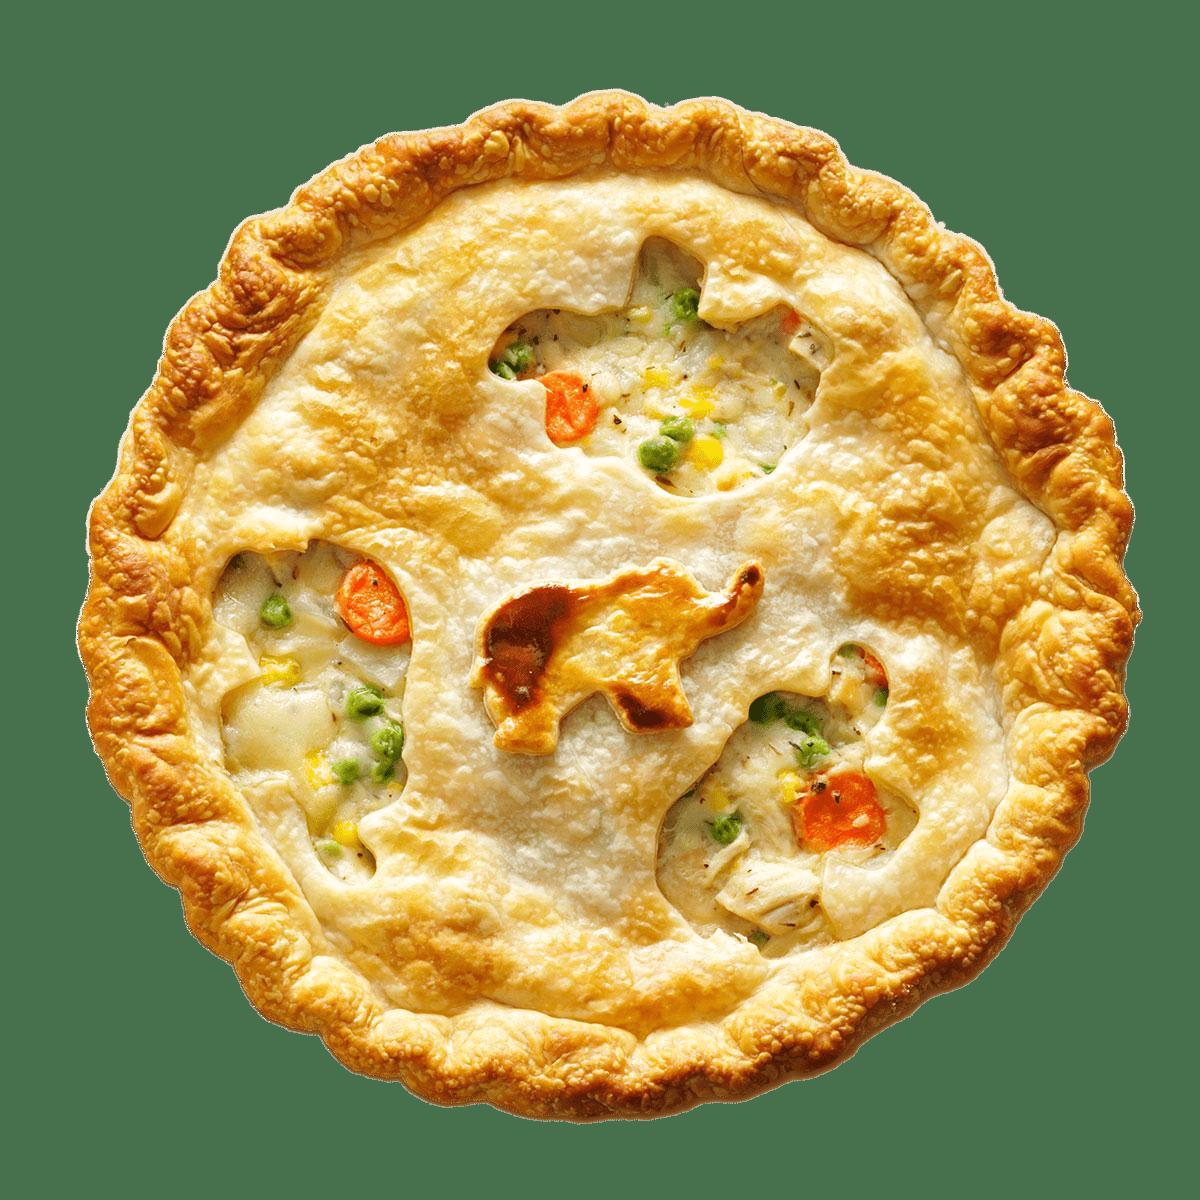 Chicken Pot Pie transparent PNG.